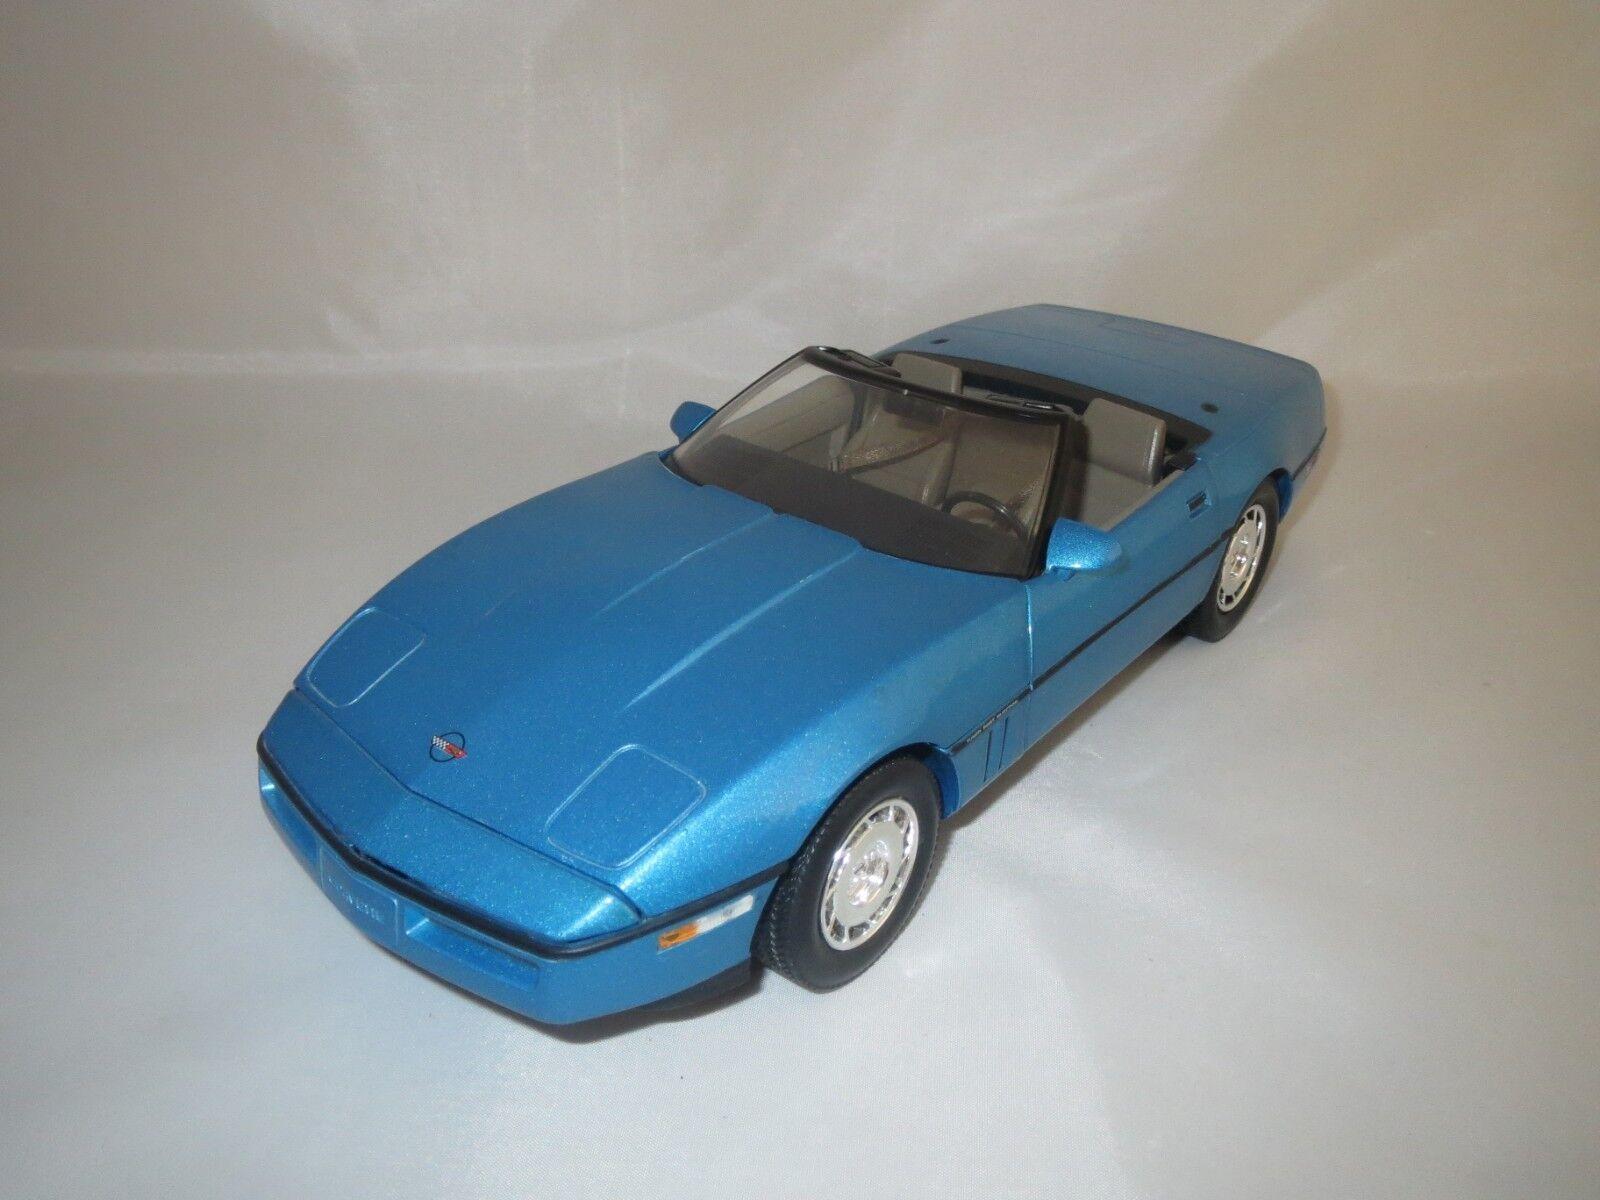 Venta en línea de descuento de fábrica verdeLight Chevrolet Corvette Corvette Corvette  1986  (azul-met.) 1 18 sin embalaje   colores increíbles